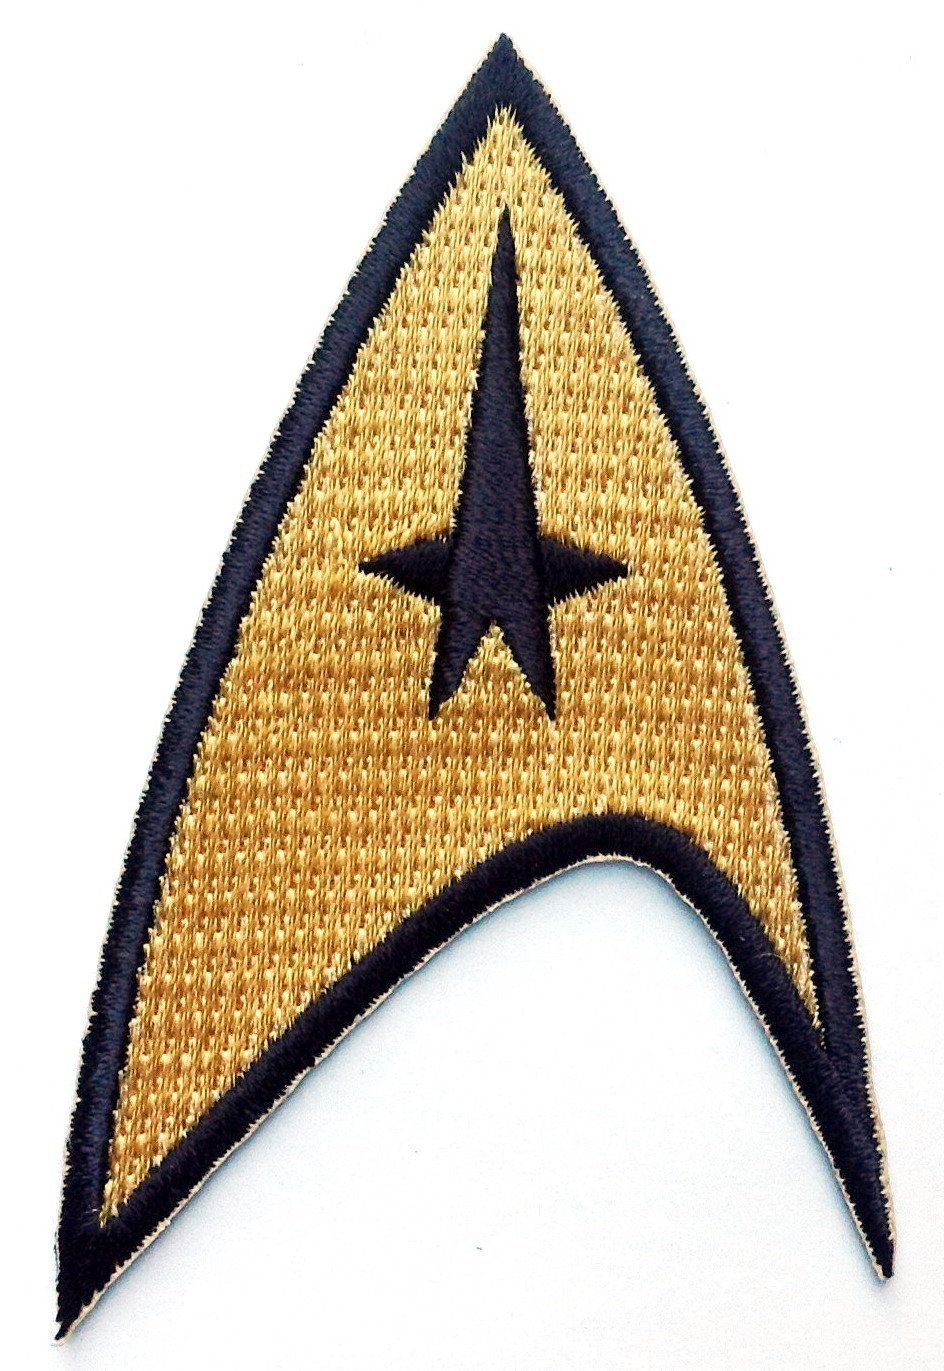 Titan One Europe Tactical Starfleet Command Star Trek Costume Cosplay Patch Klettband Taktisch Aufn/äher